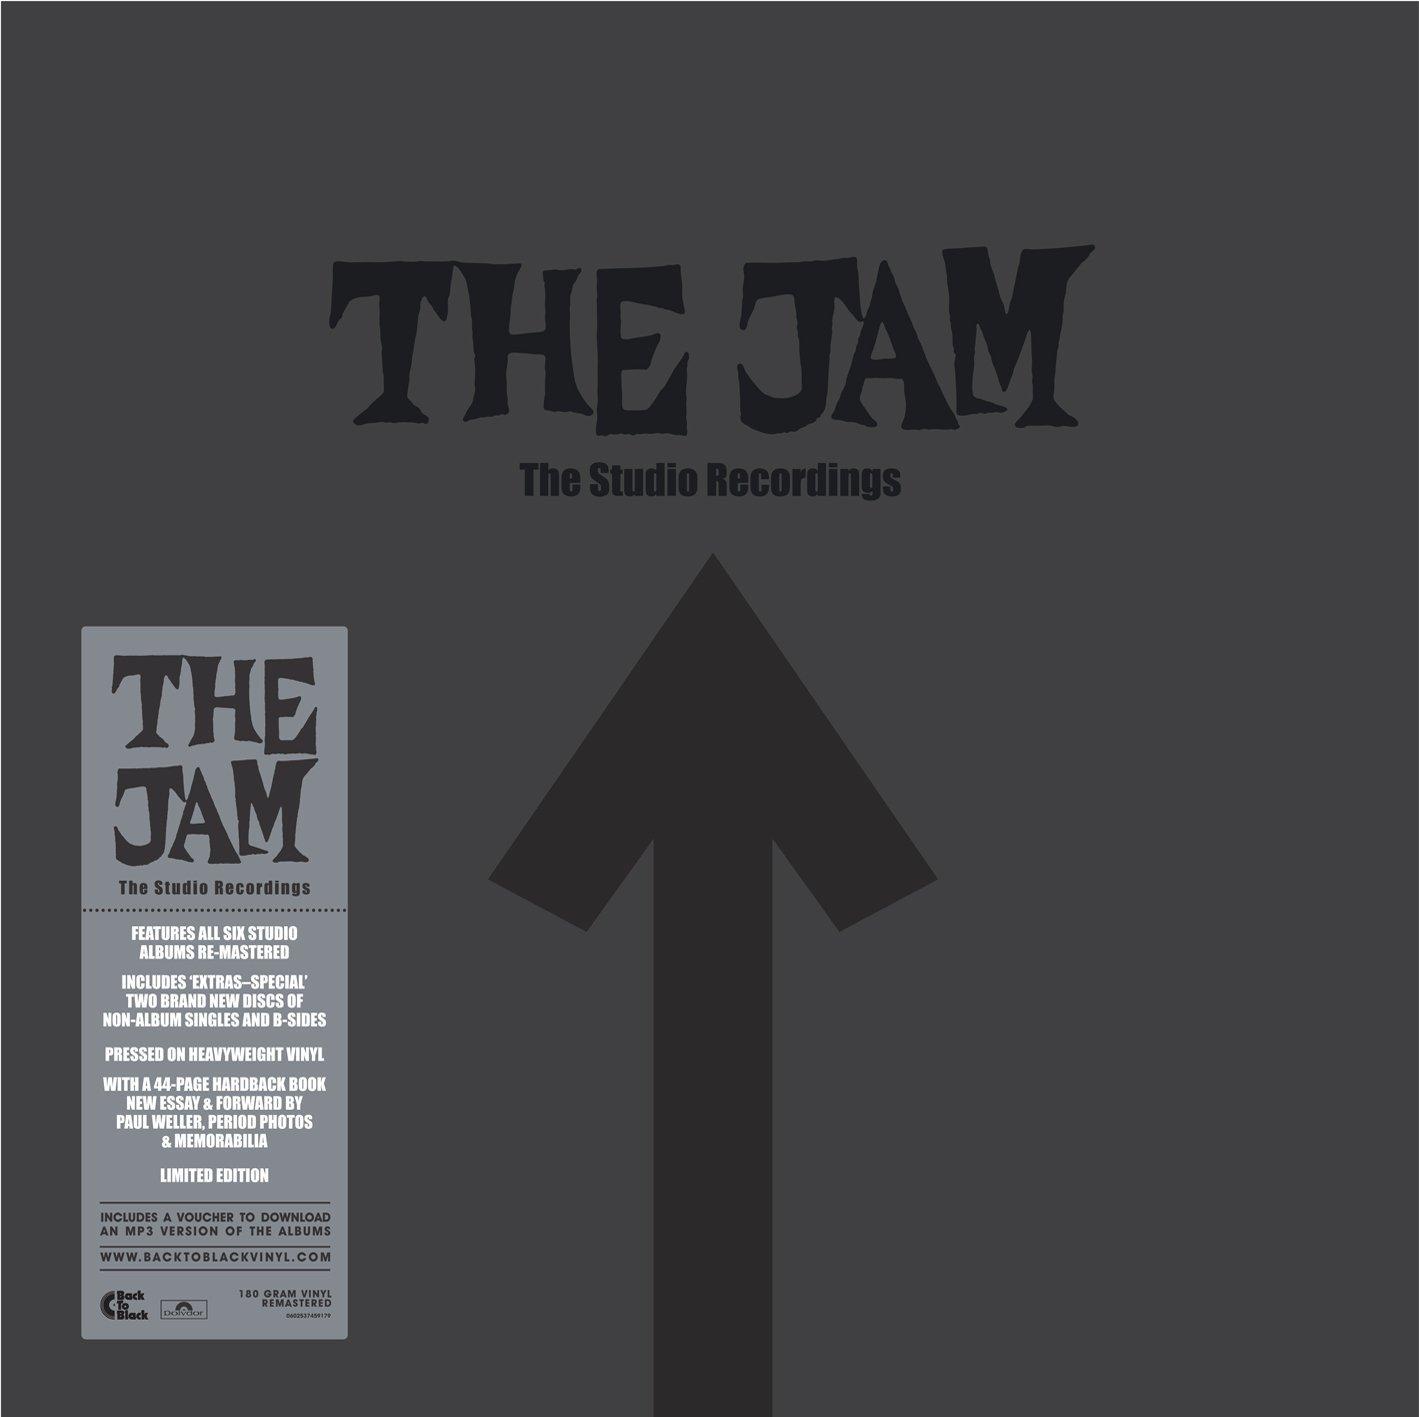 The Jam / The Studio Recordings: 8LP career-spanning vinyl box